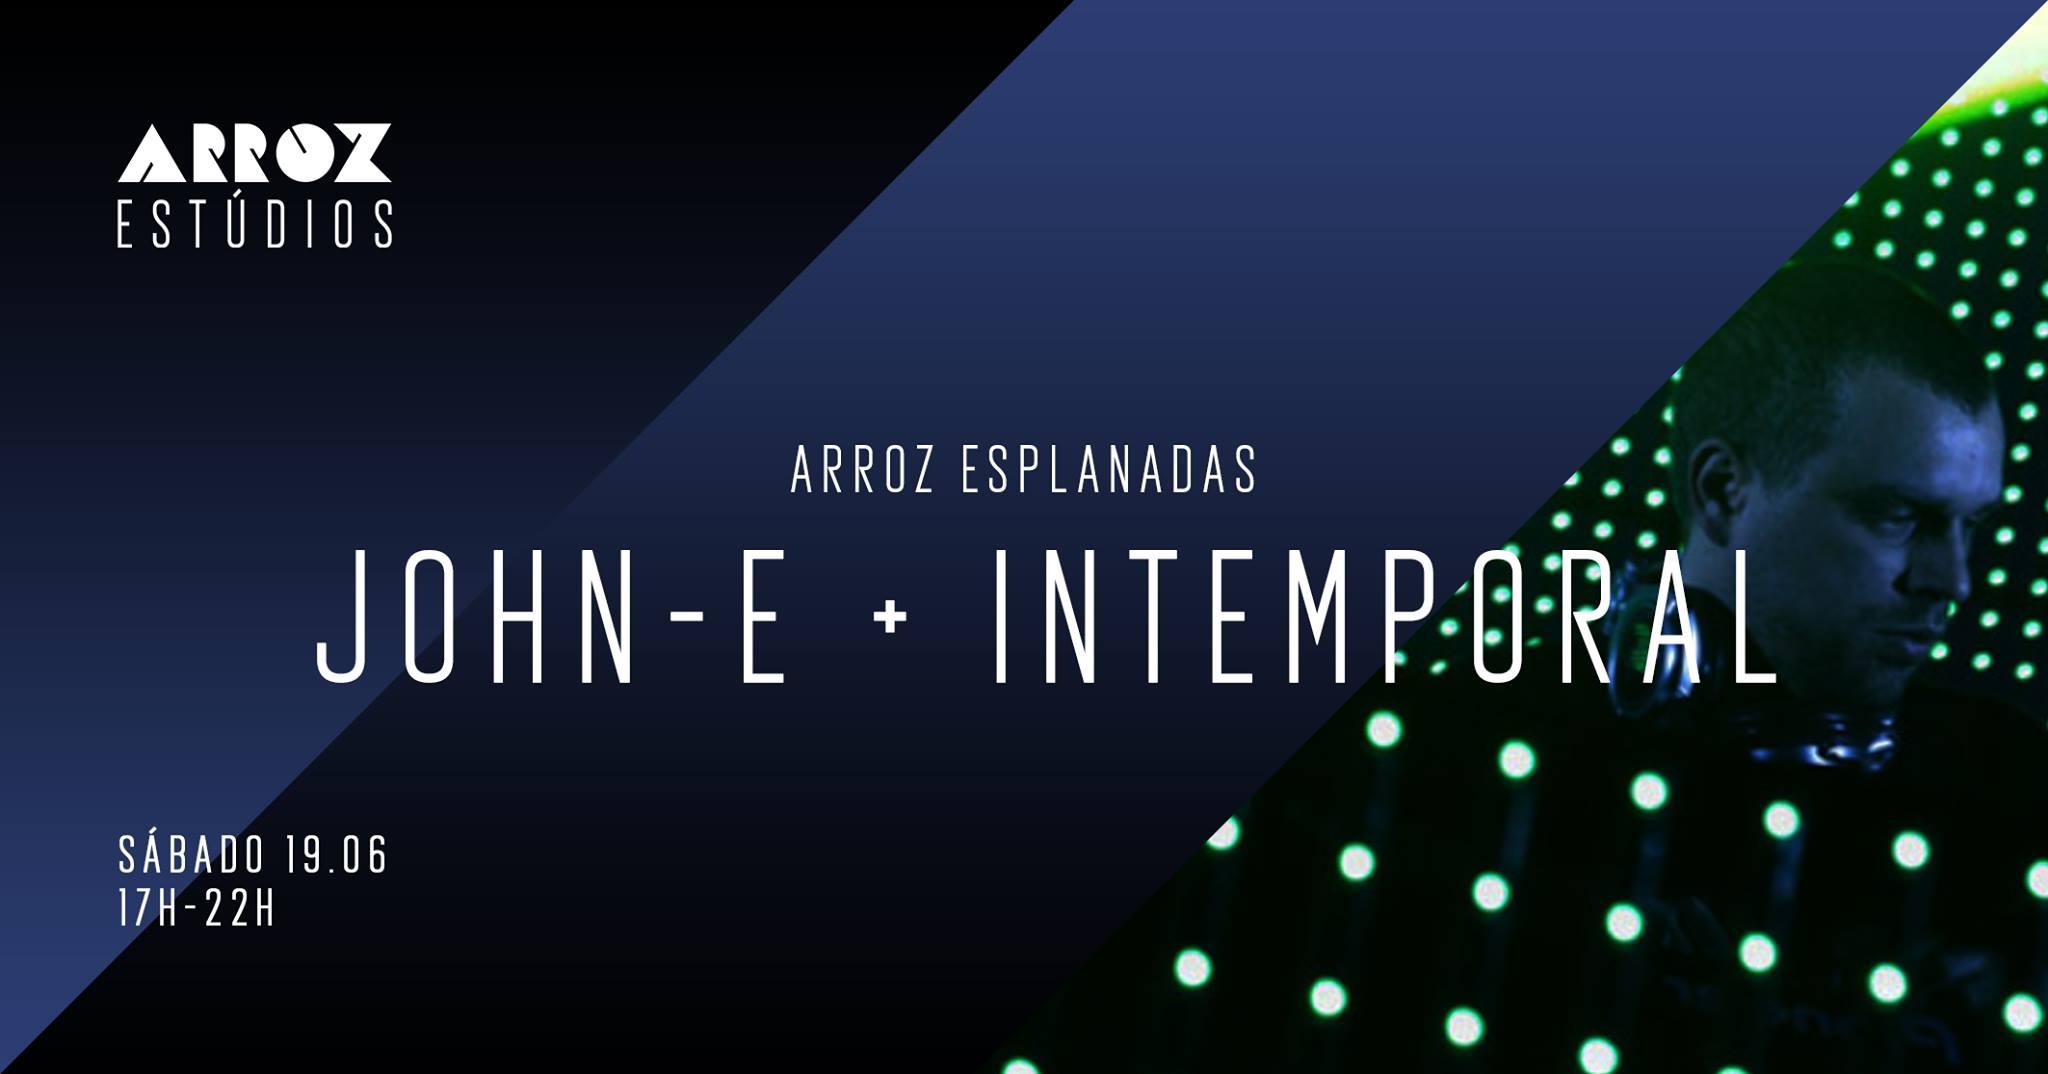 John-e + intemporal - Arroz Esplanadas